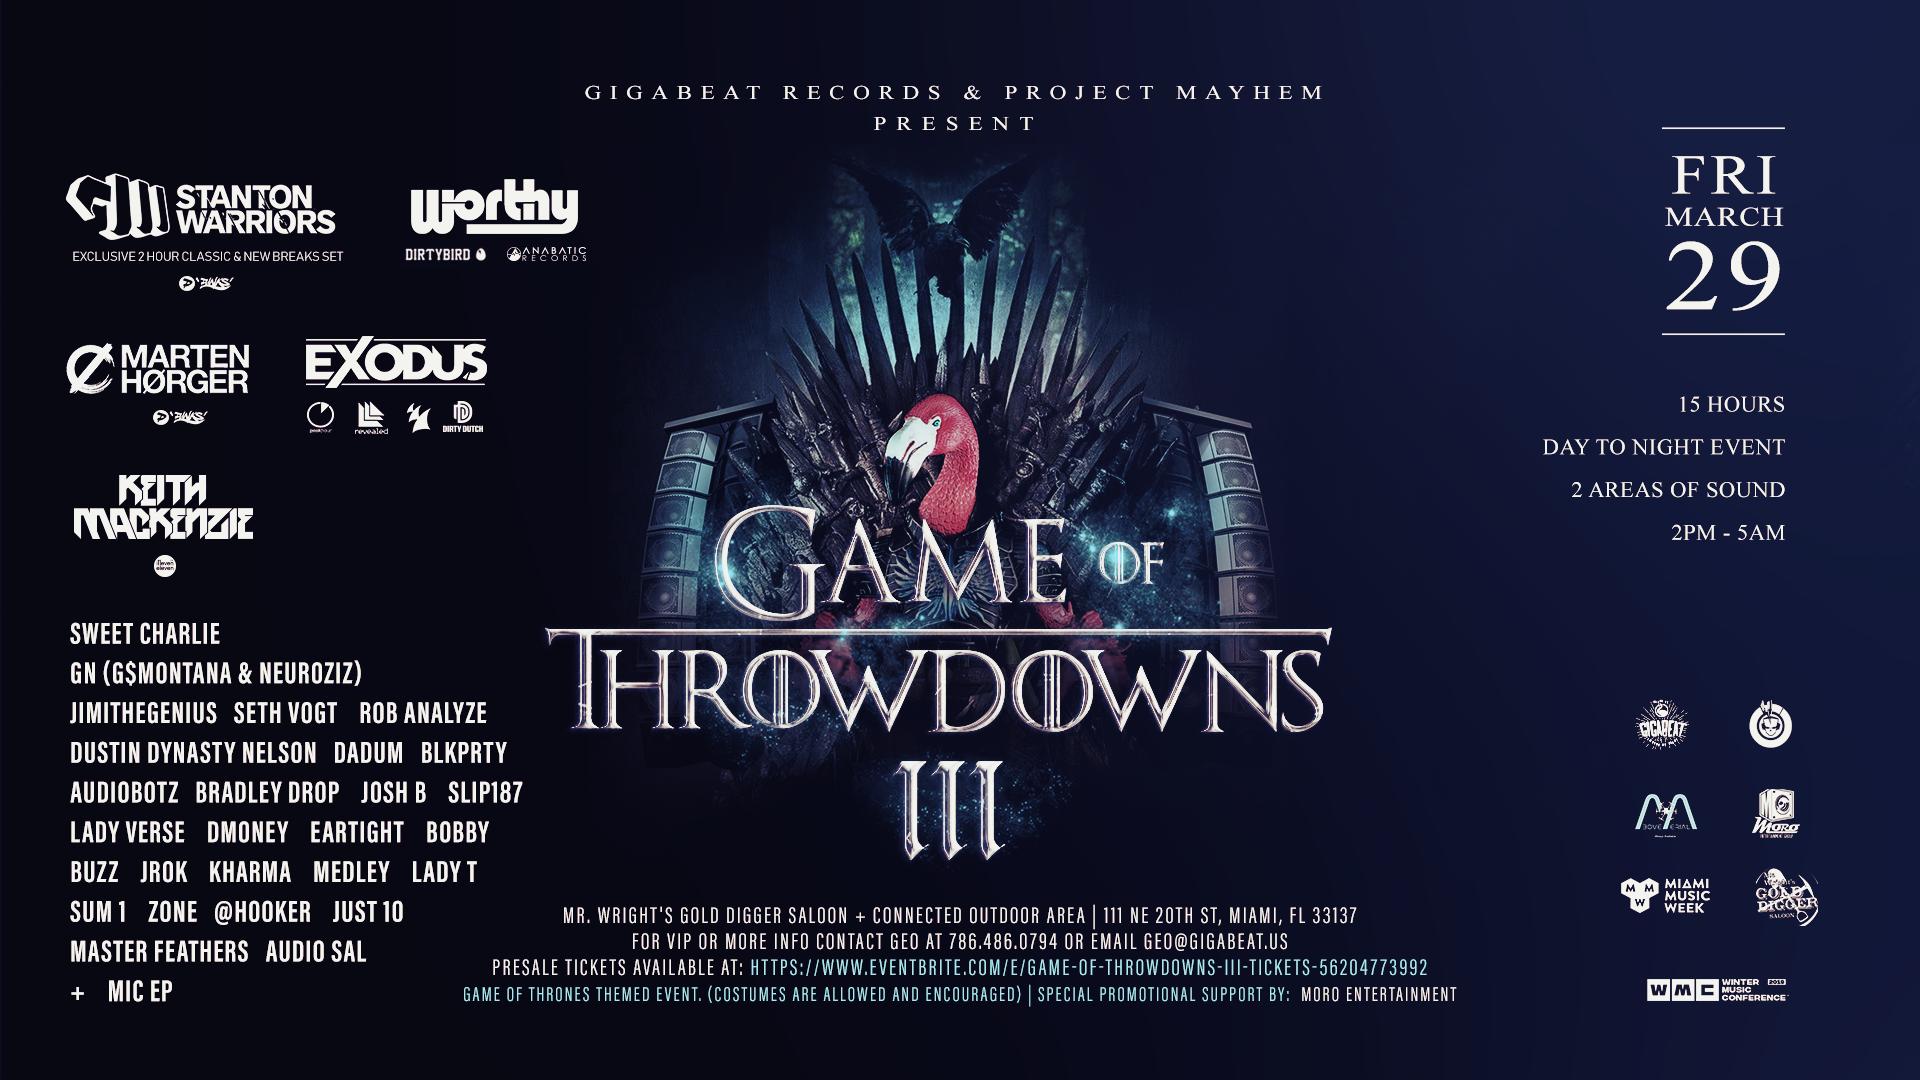 Game Of Throwdowns III Image